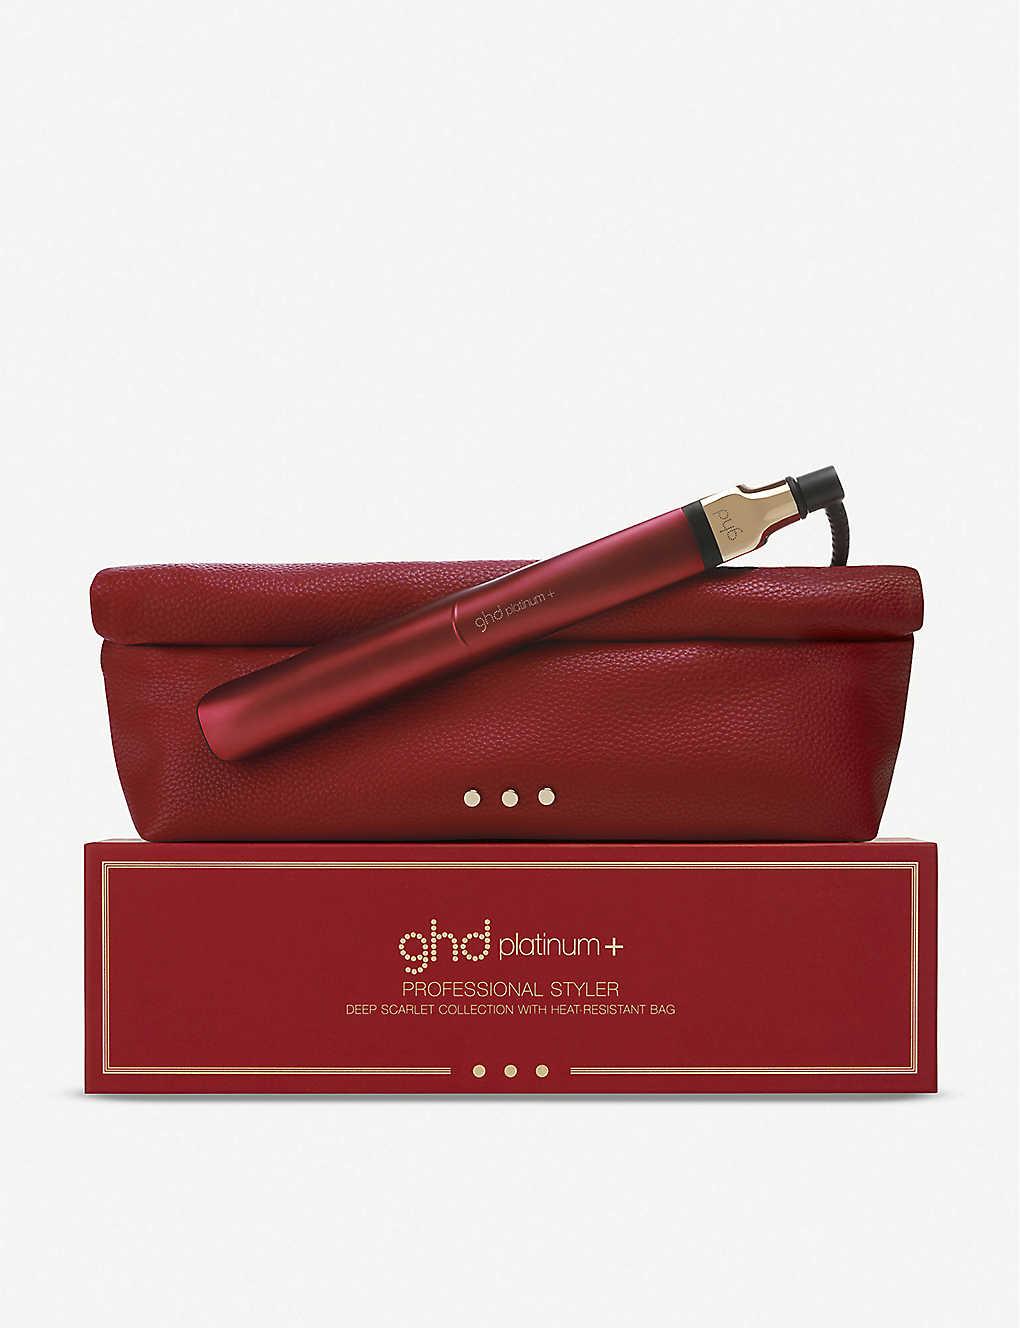 ghd Platinum+ limited-edition styler - Deep Scarlet